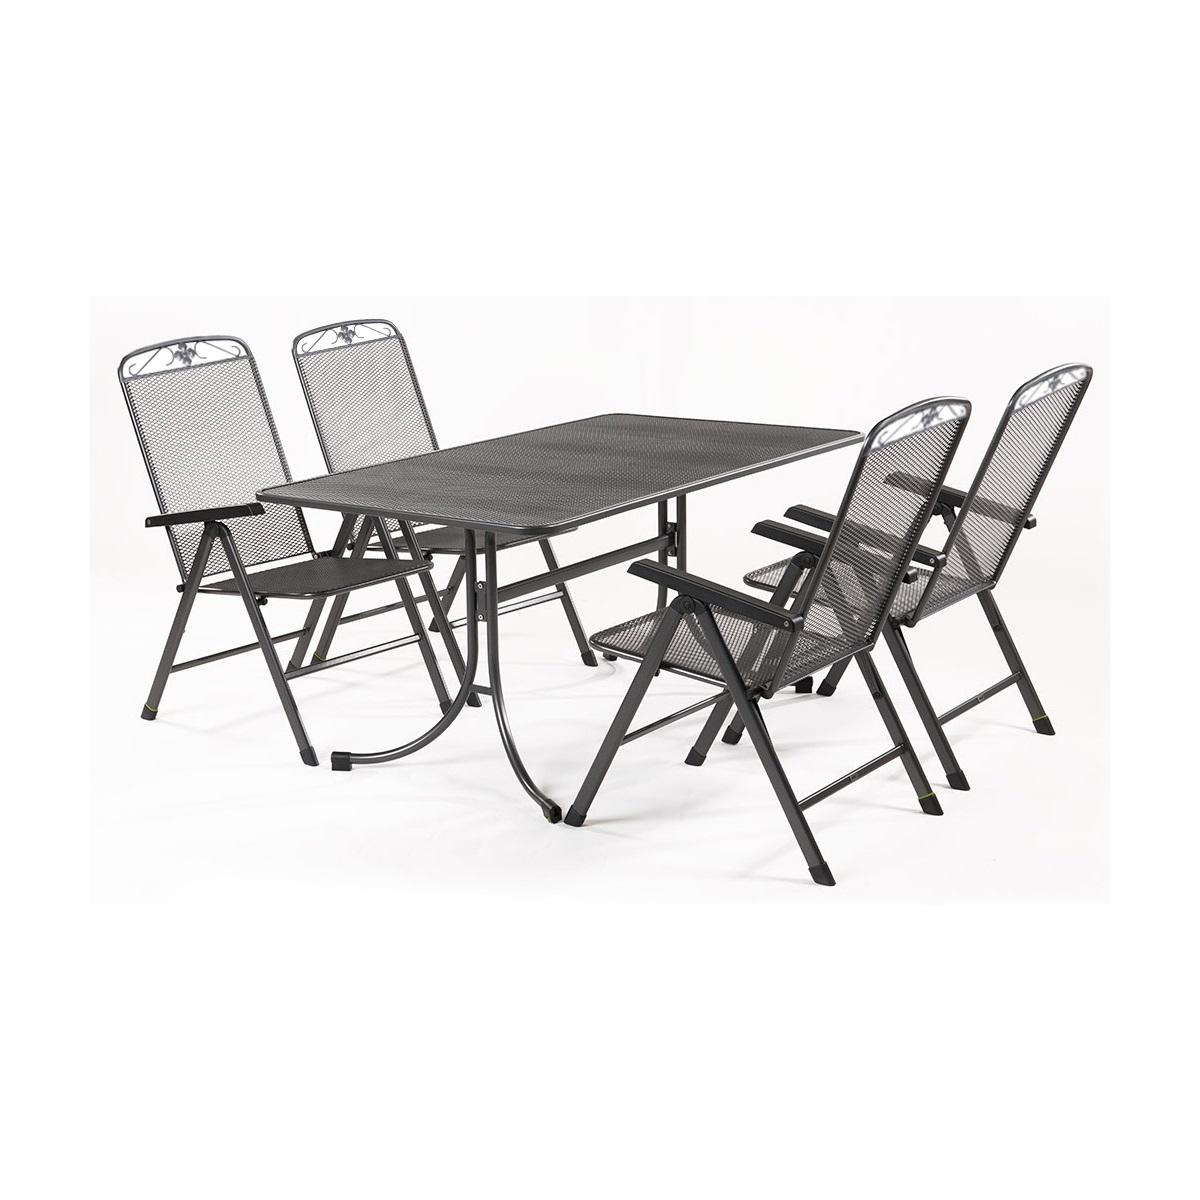 Sestava nábytku z tahokovu (4x pol. křeslo Savoy, 1x stůl Universal 160) MWH Basanis 4+